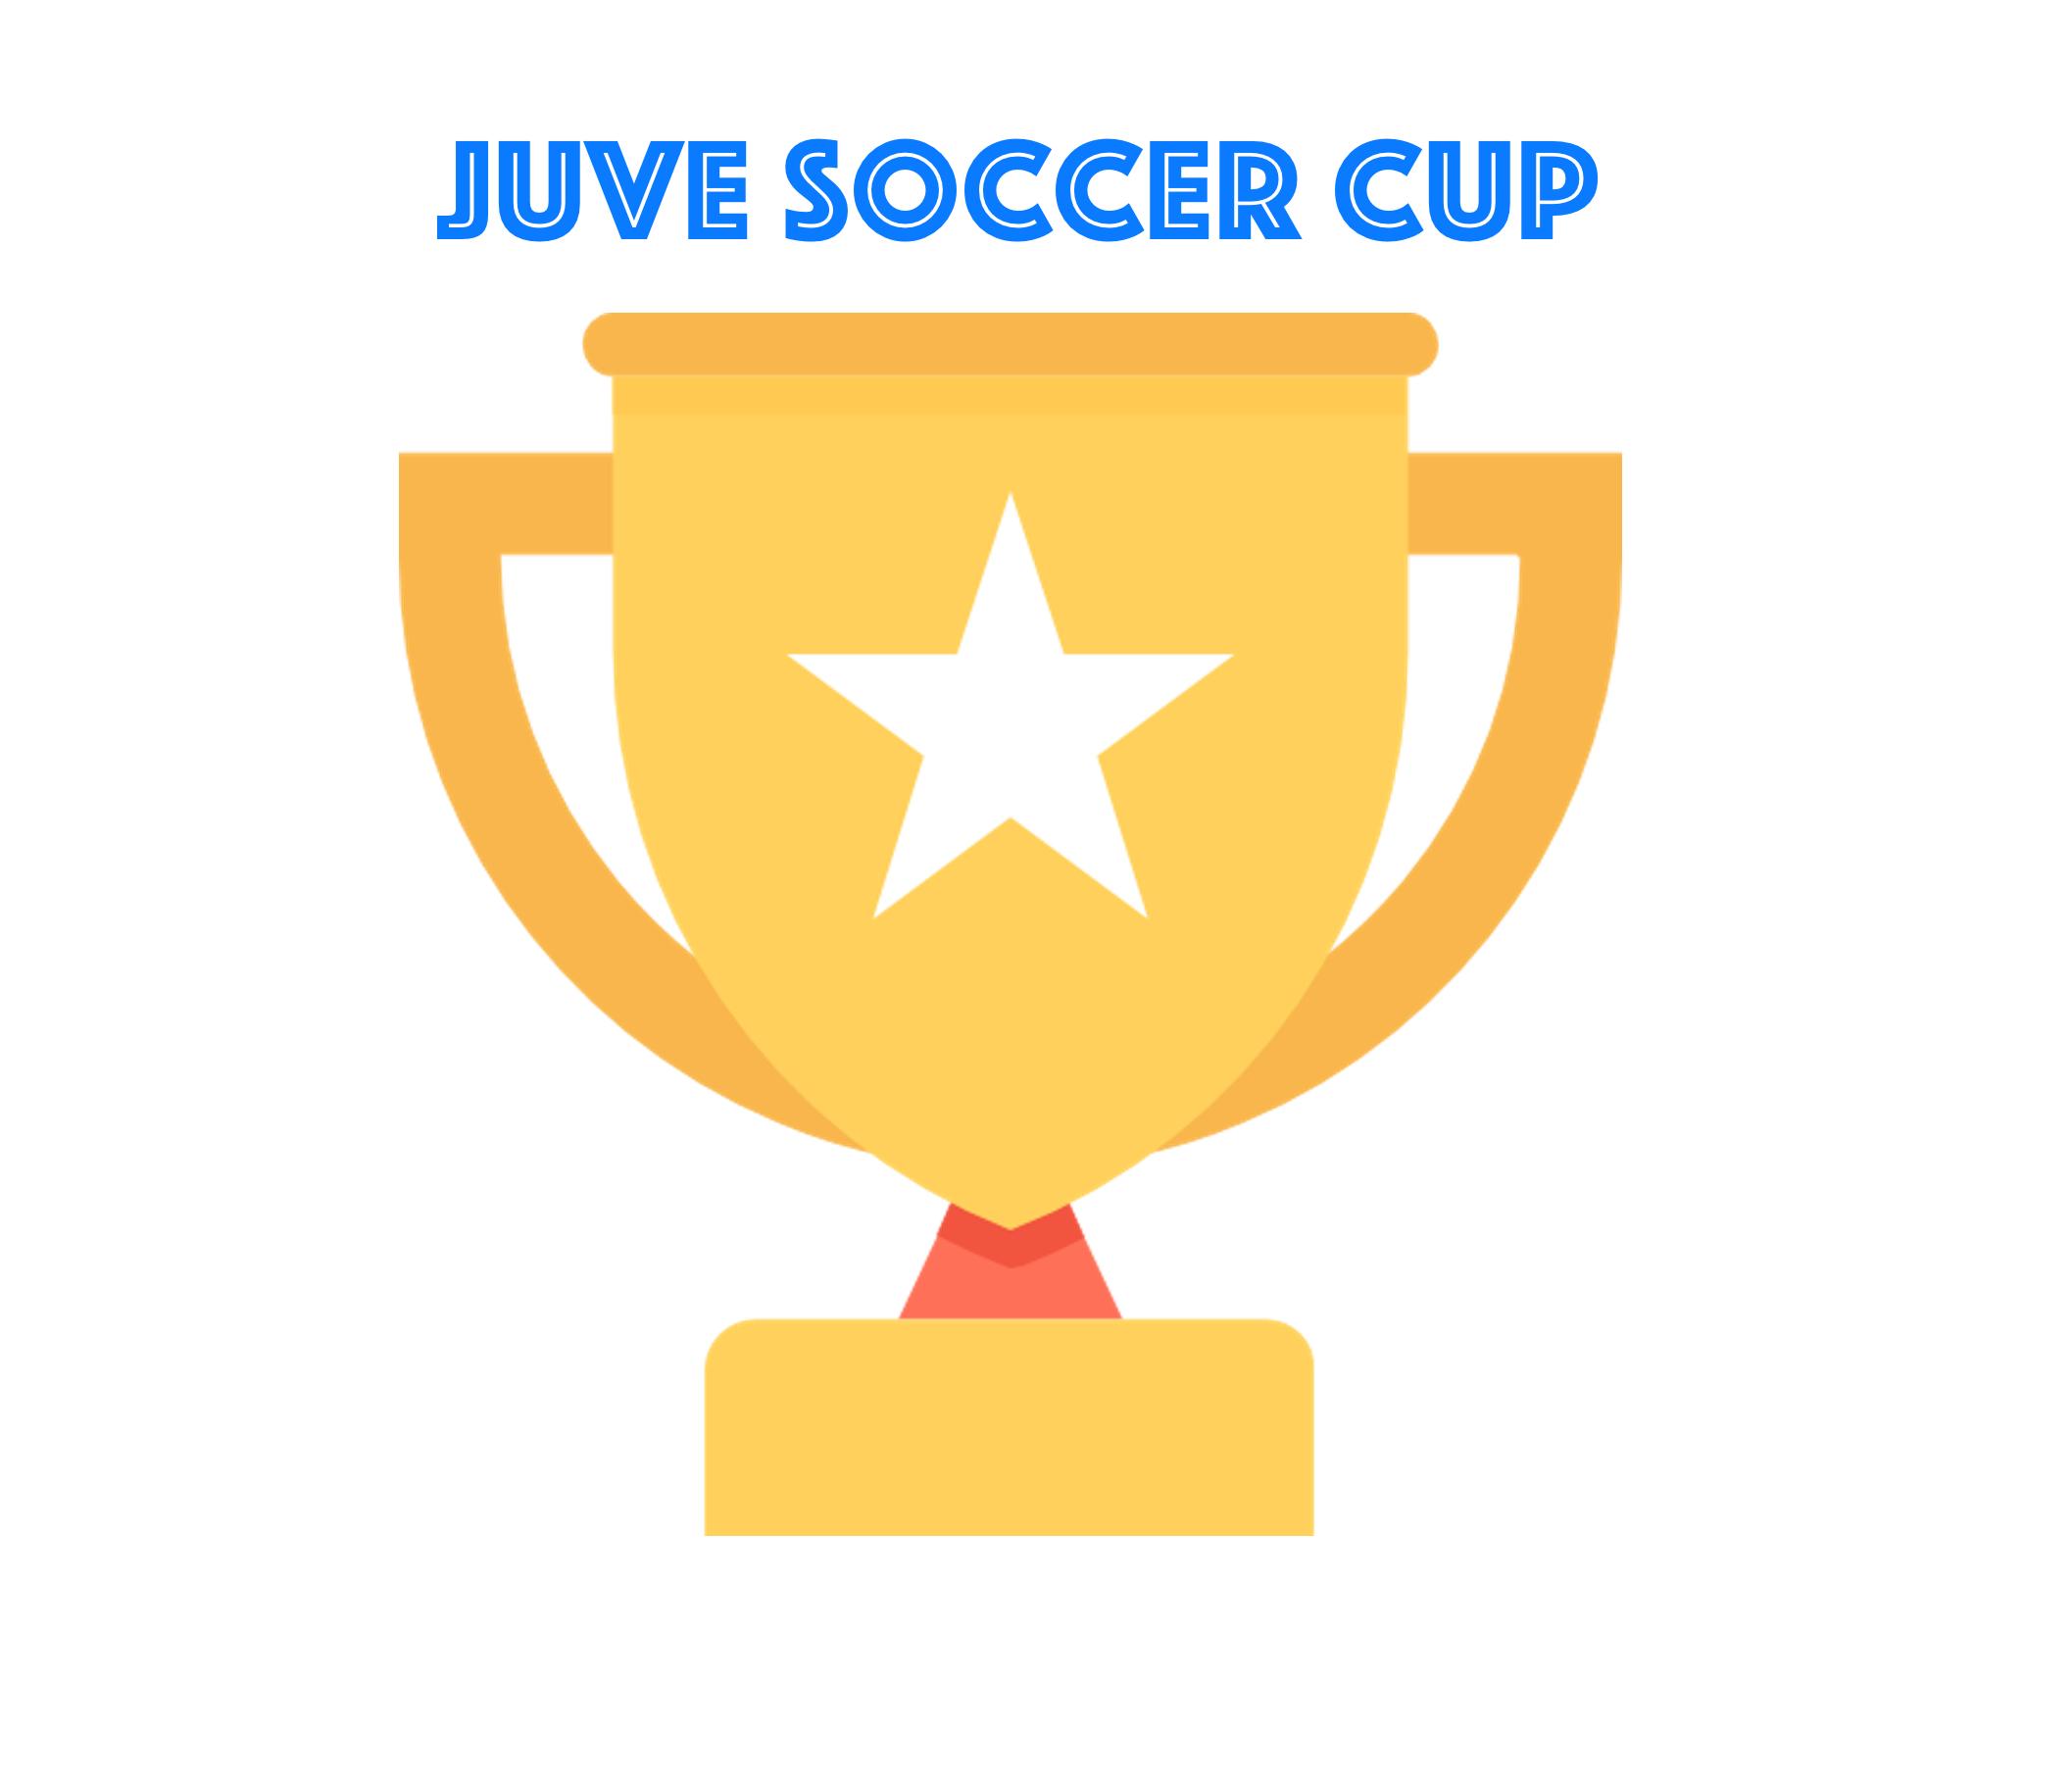 juve soccer cup